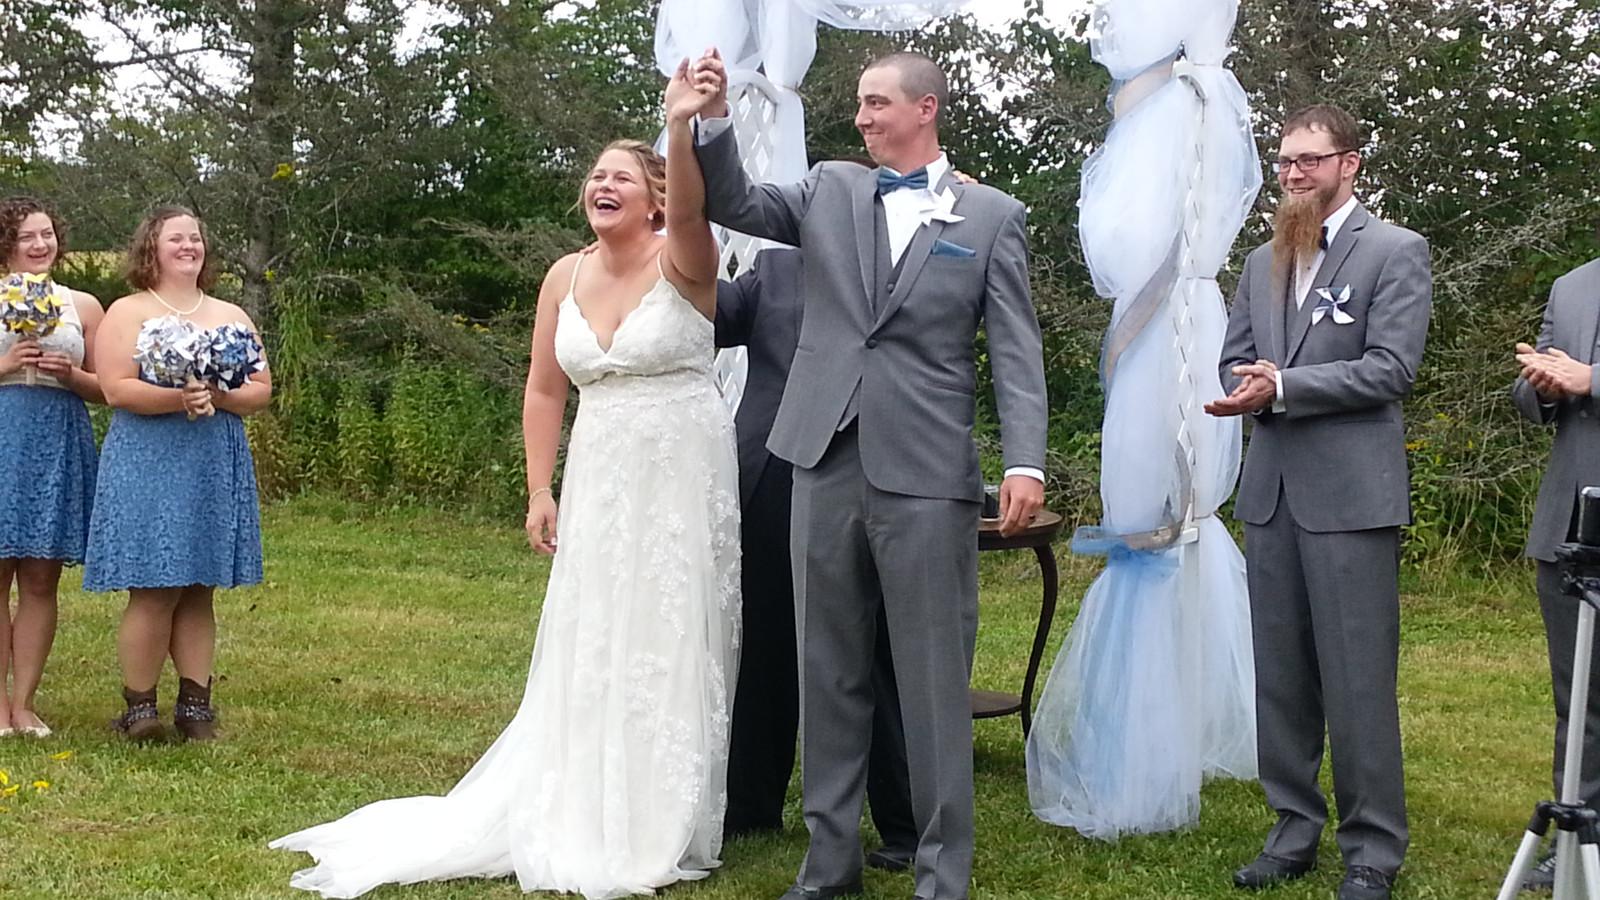 wedding officiant us simple ceremonies of nepa